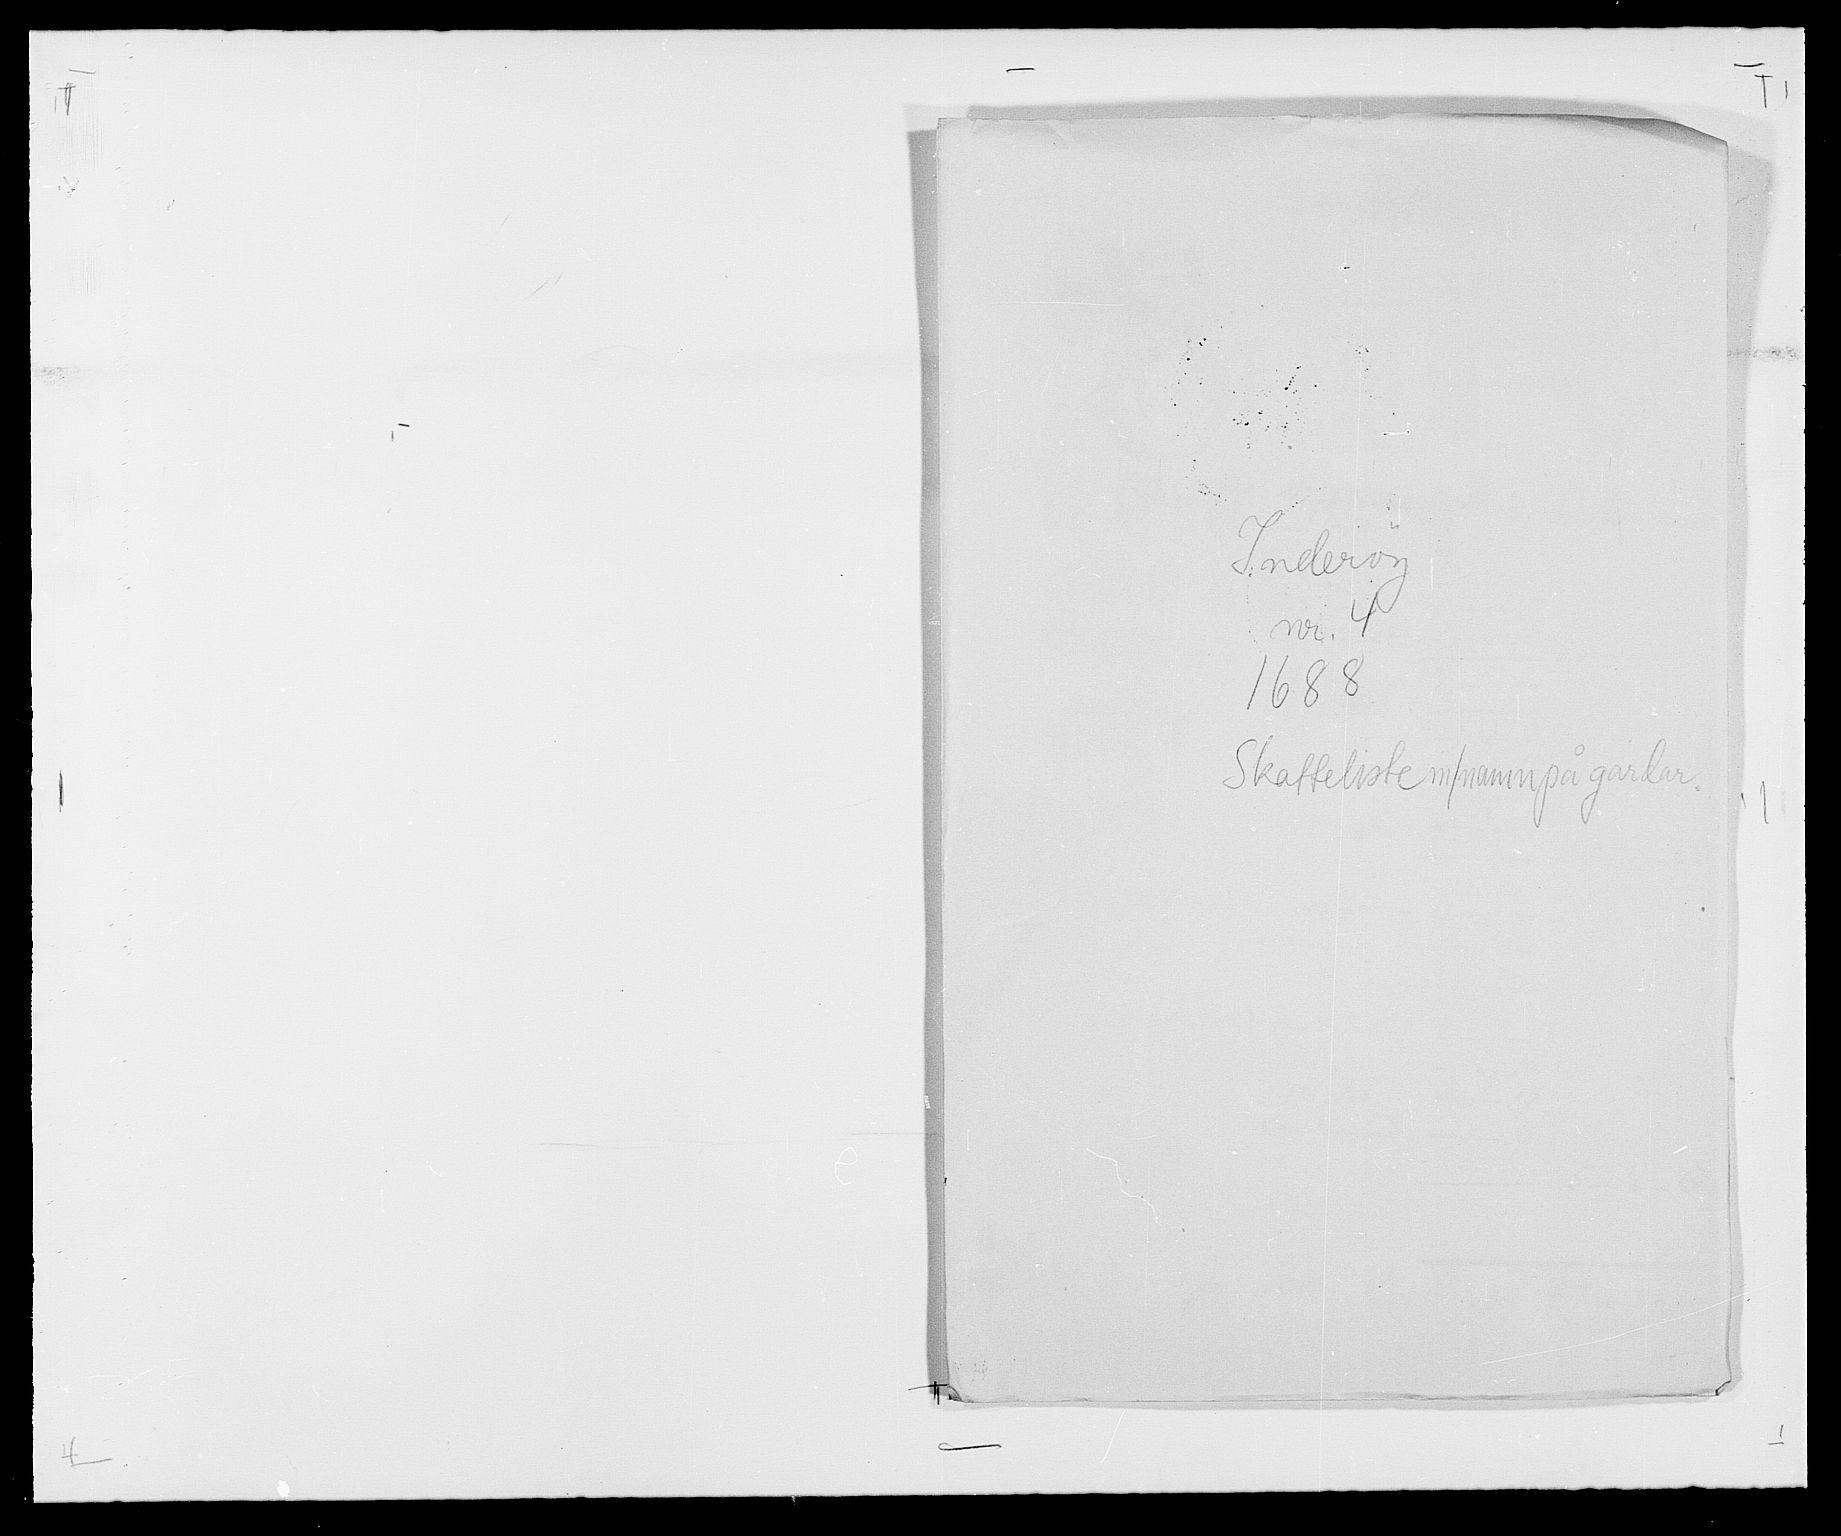 RA, Rentekammeret inntil 1814, Reviderte regnskaper, Fogderegnskap, R63/L4306: Fogderegnskap Inderøy, 1687-1689, s. 370